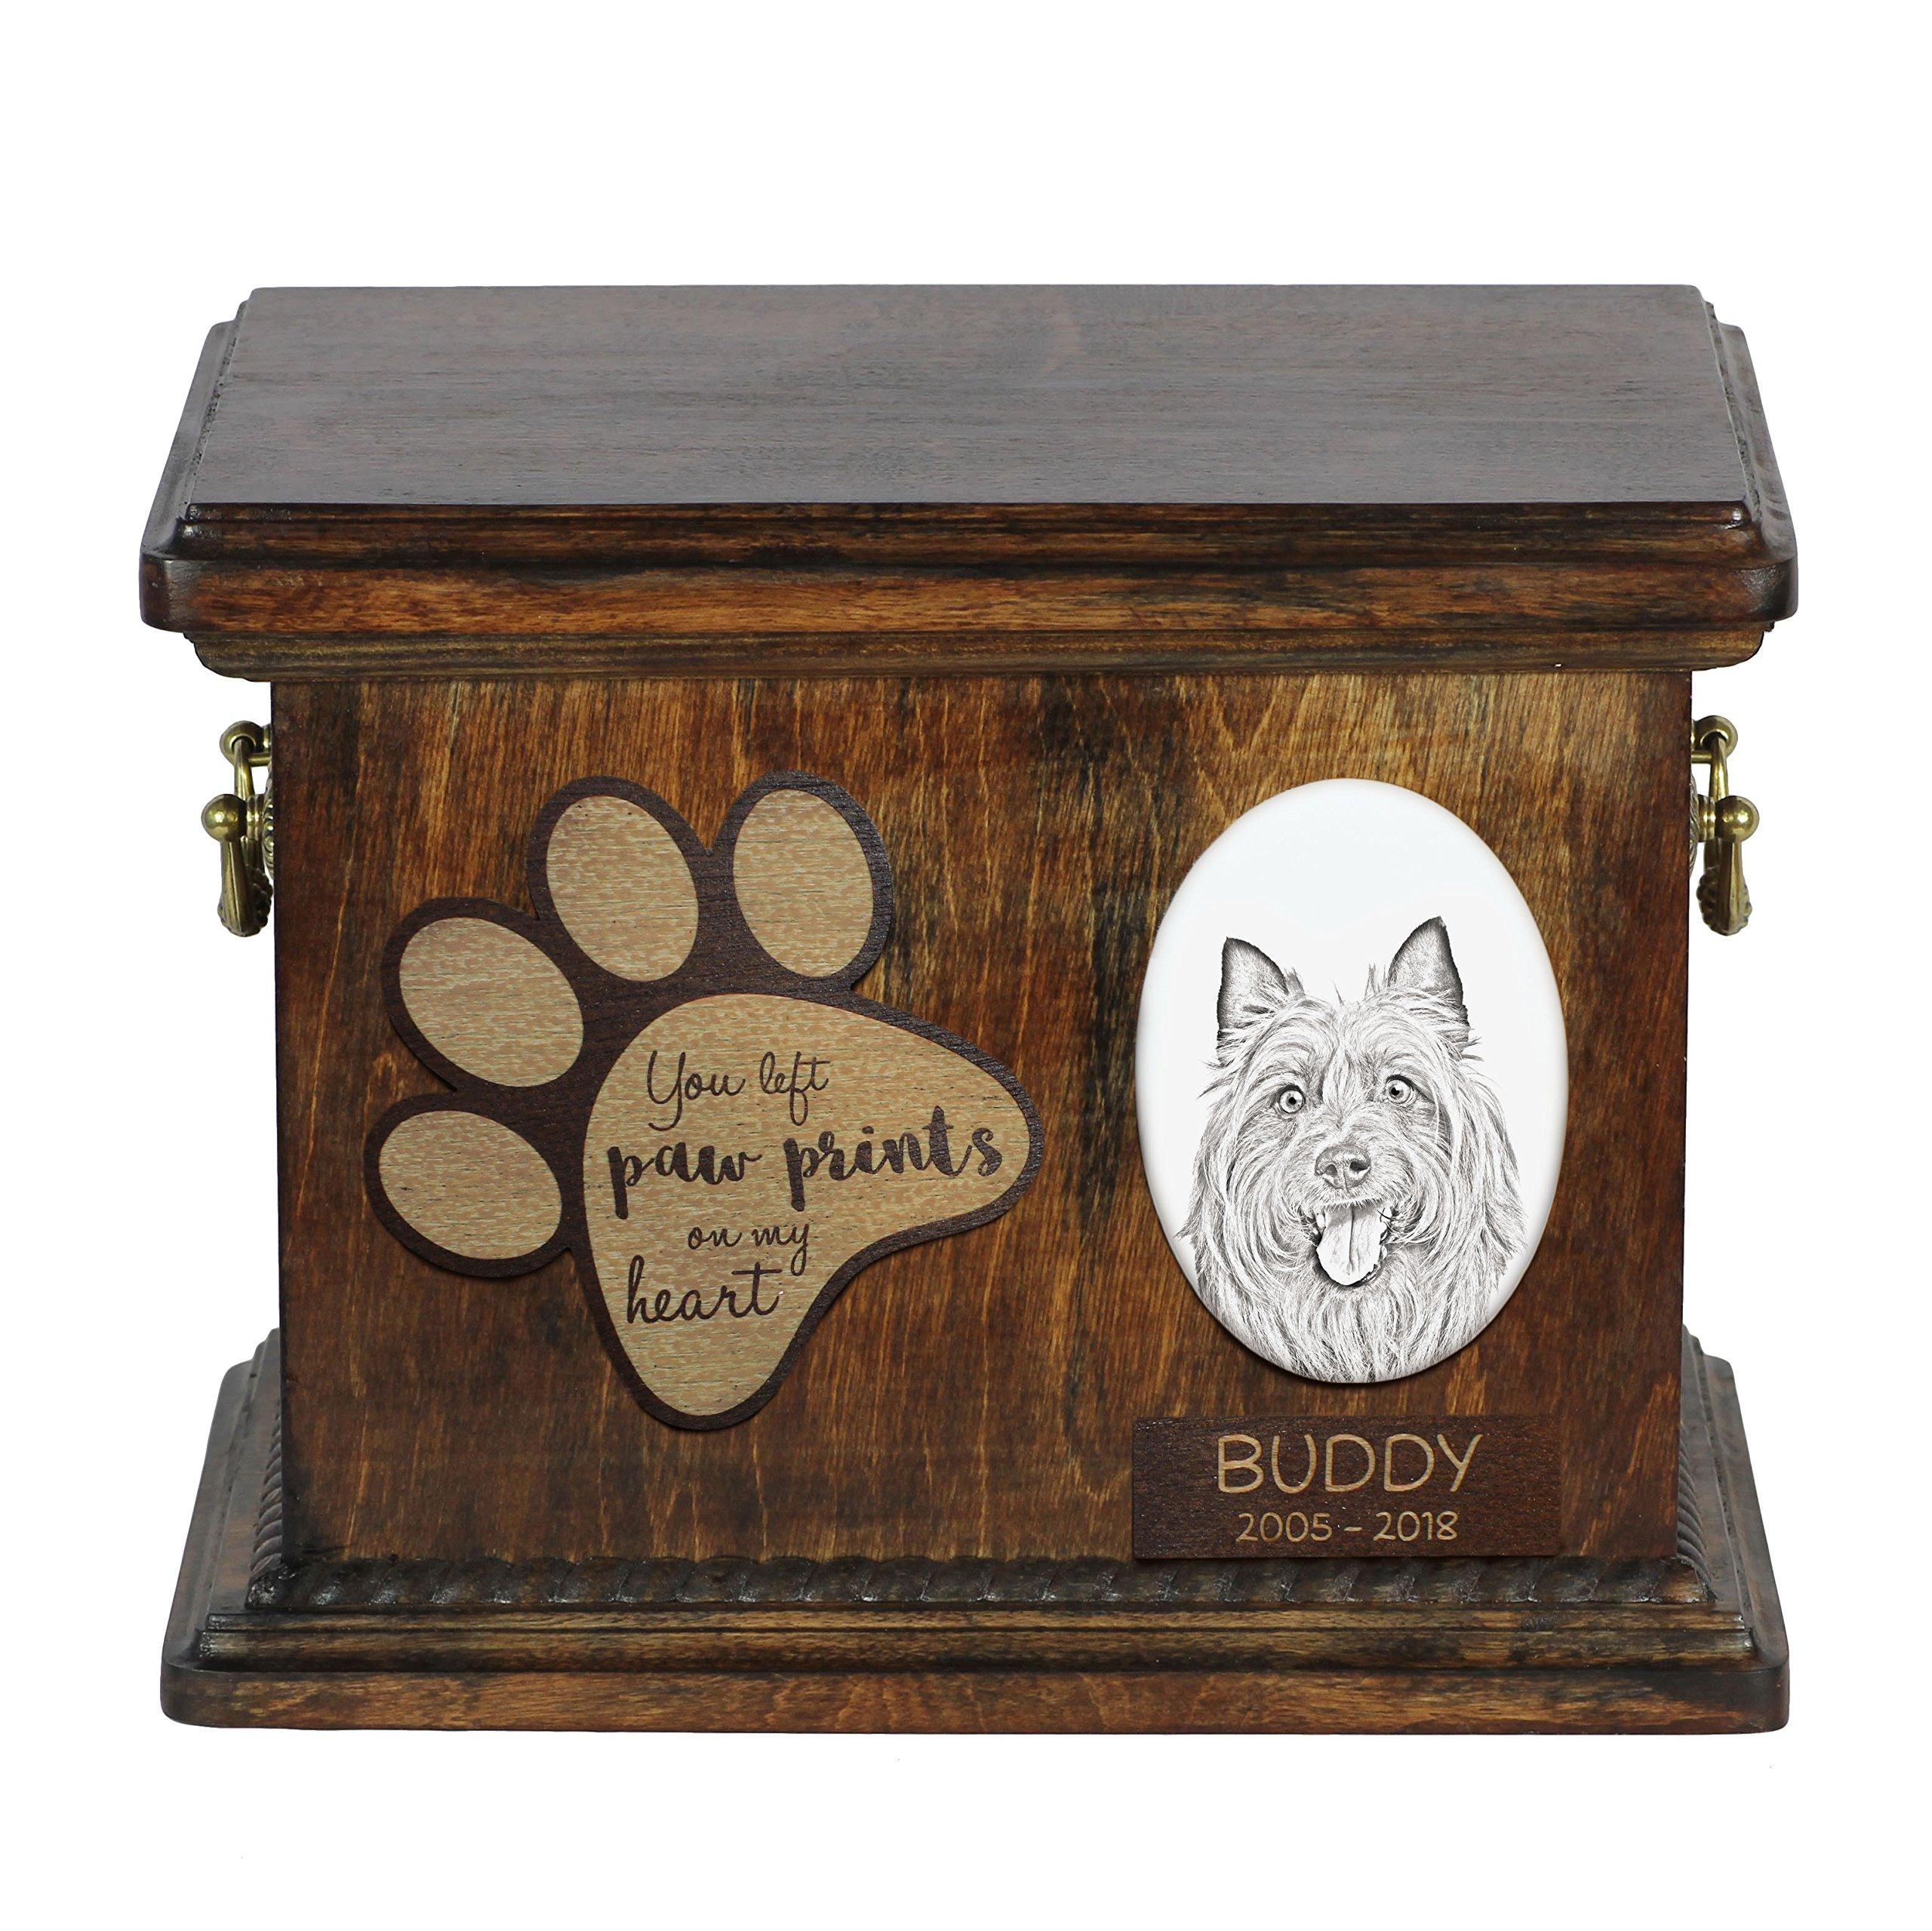 ArtDog Ltd. Australian Terrier, urn for dog's ashes with ceramic plate and description